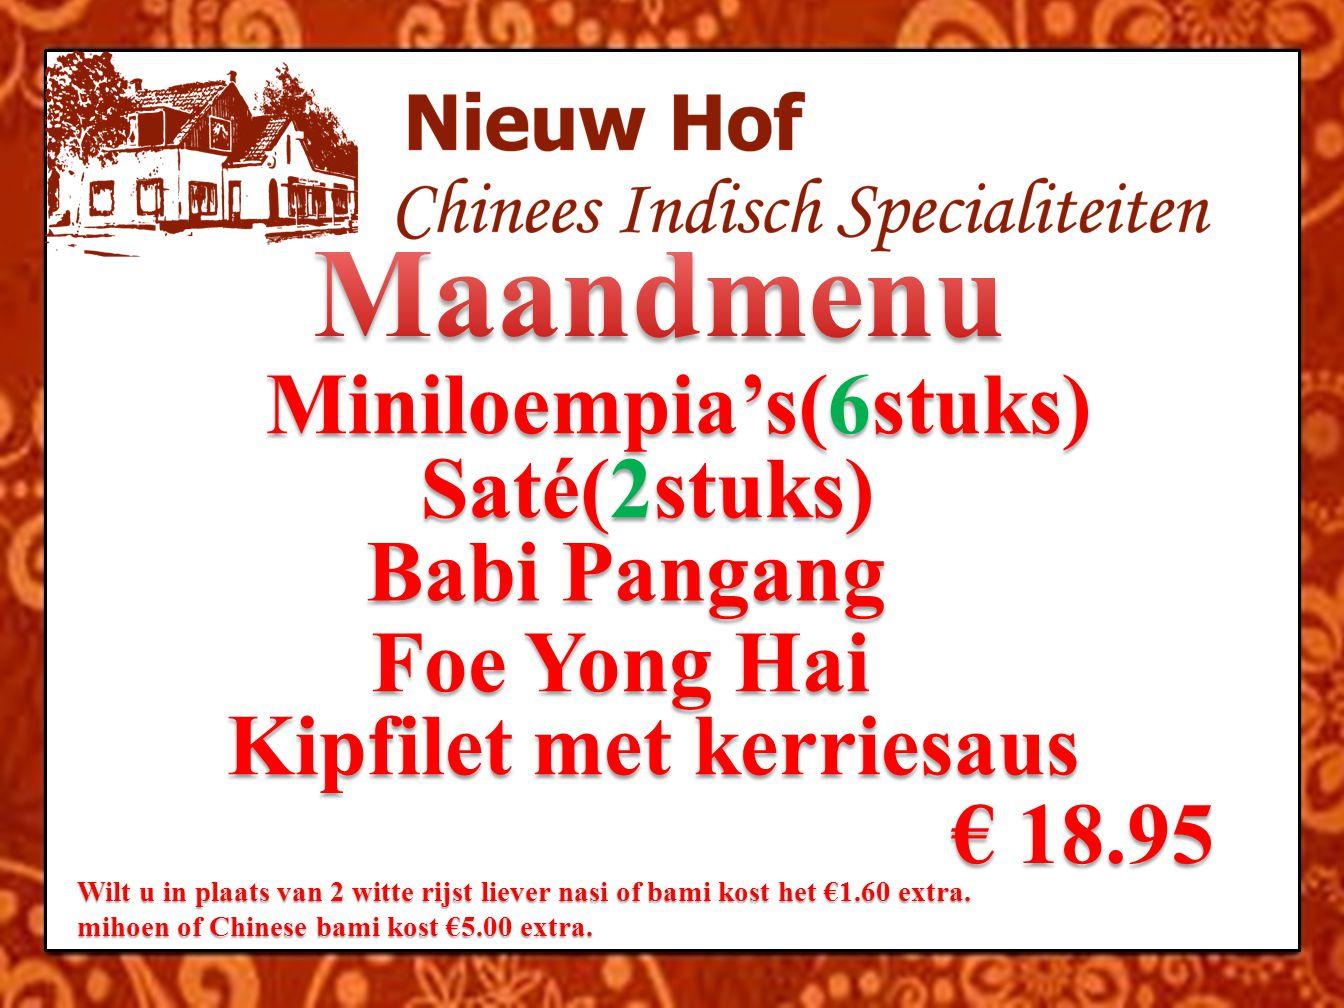 Miniloempia's(6stuks) Saté(2stuks) Babi Pangang Foe Yong Hai Kipfilet met kerriesaus € 18.95 € 18.95 Wilt u in plaats van 2 witte rijst liever nasi of